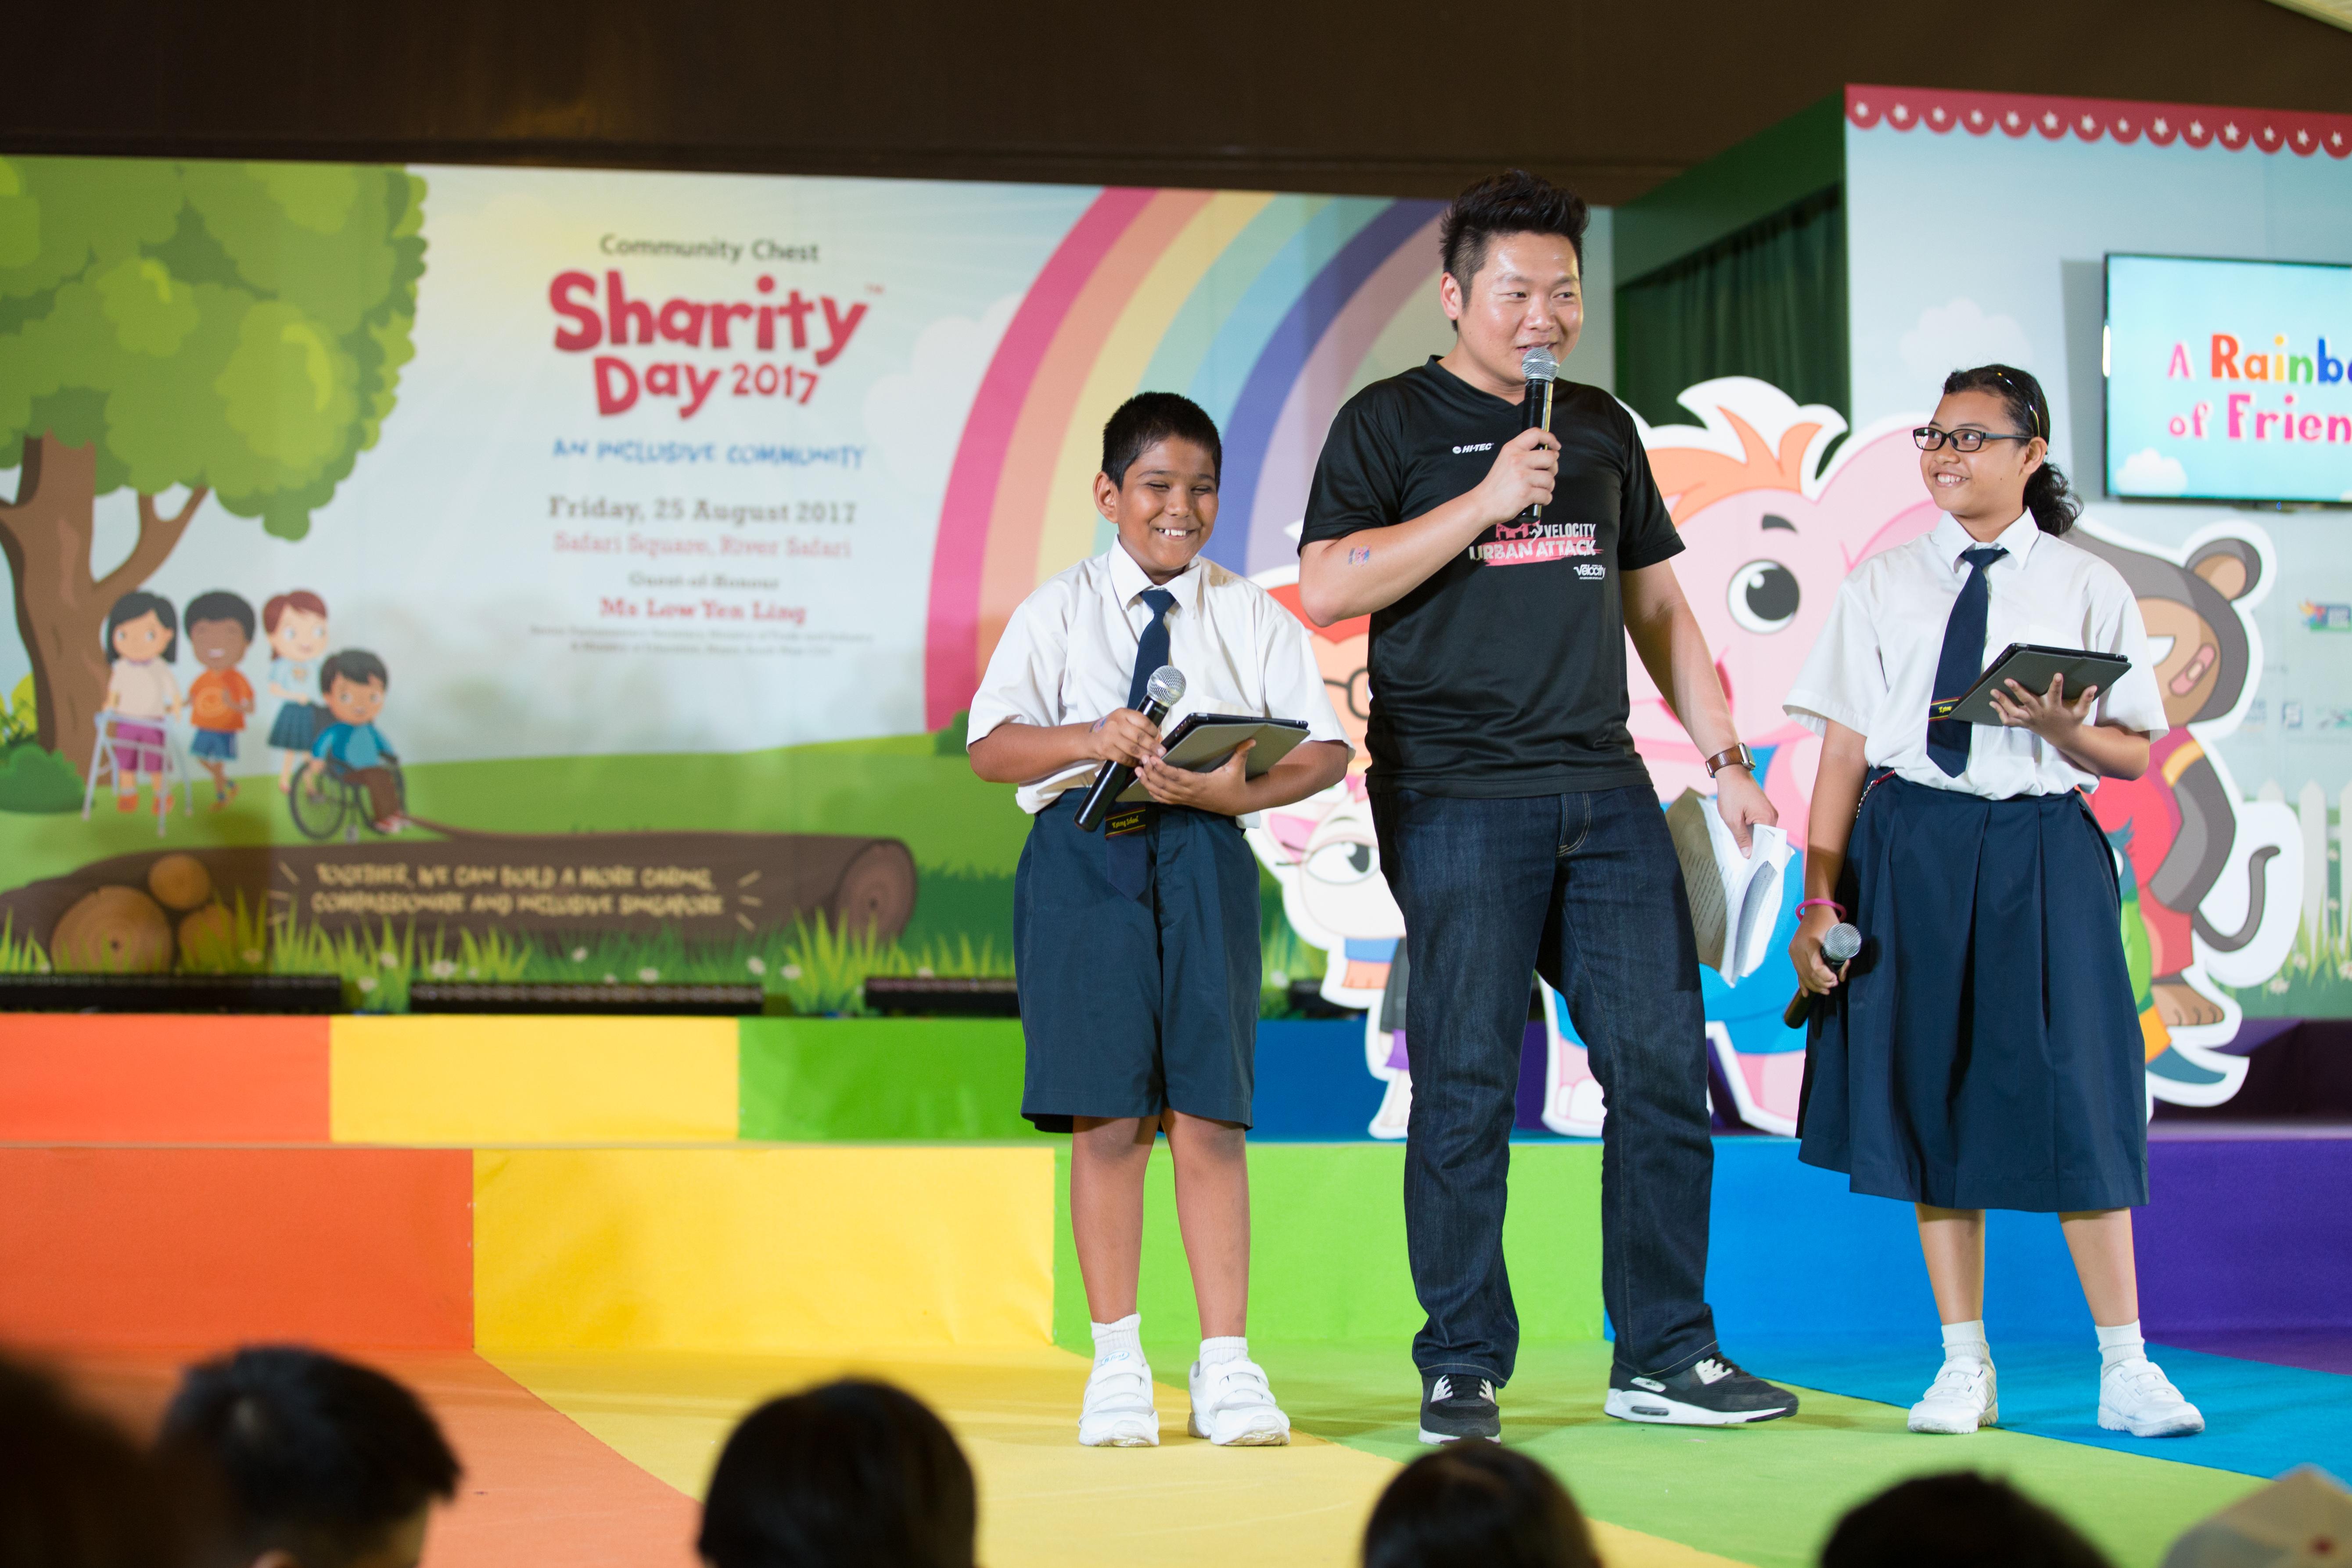 singapore performance photographer